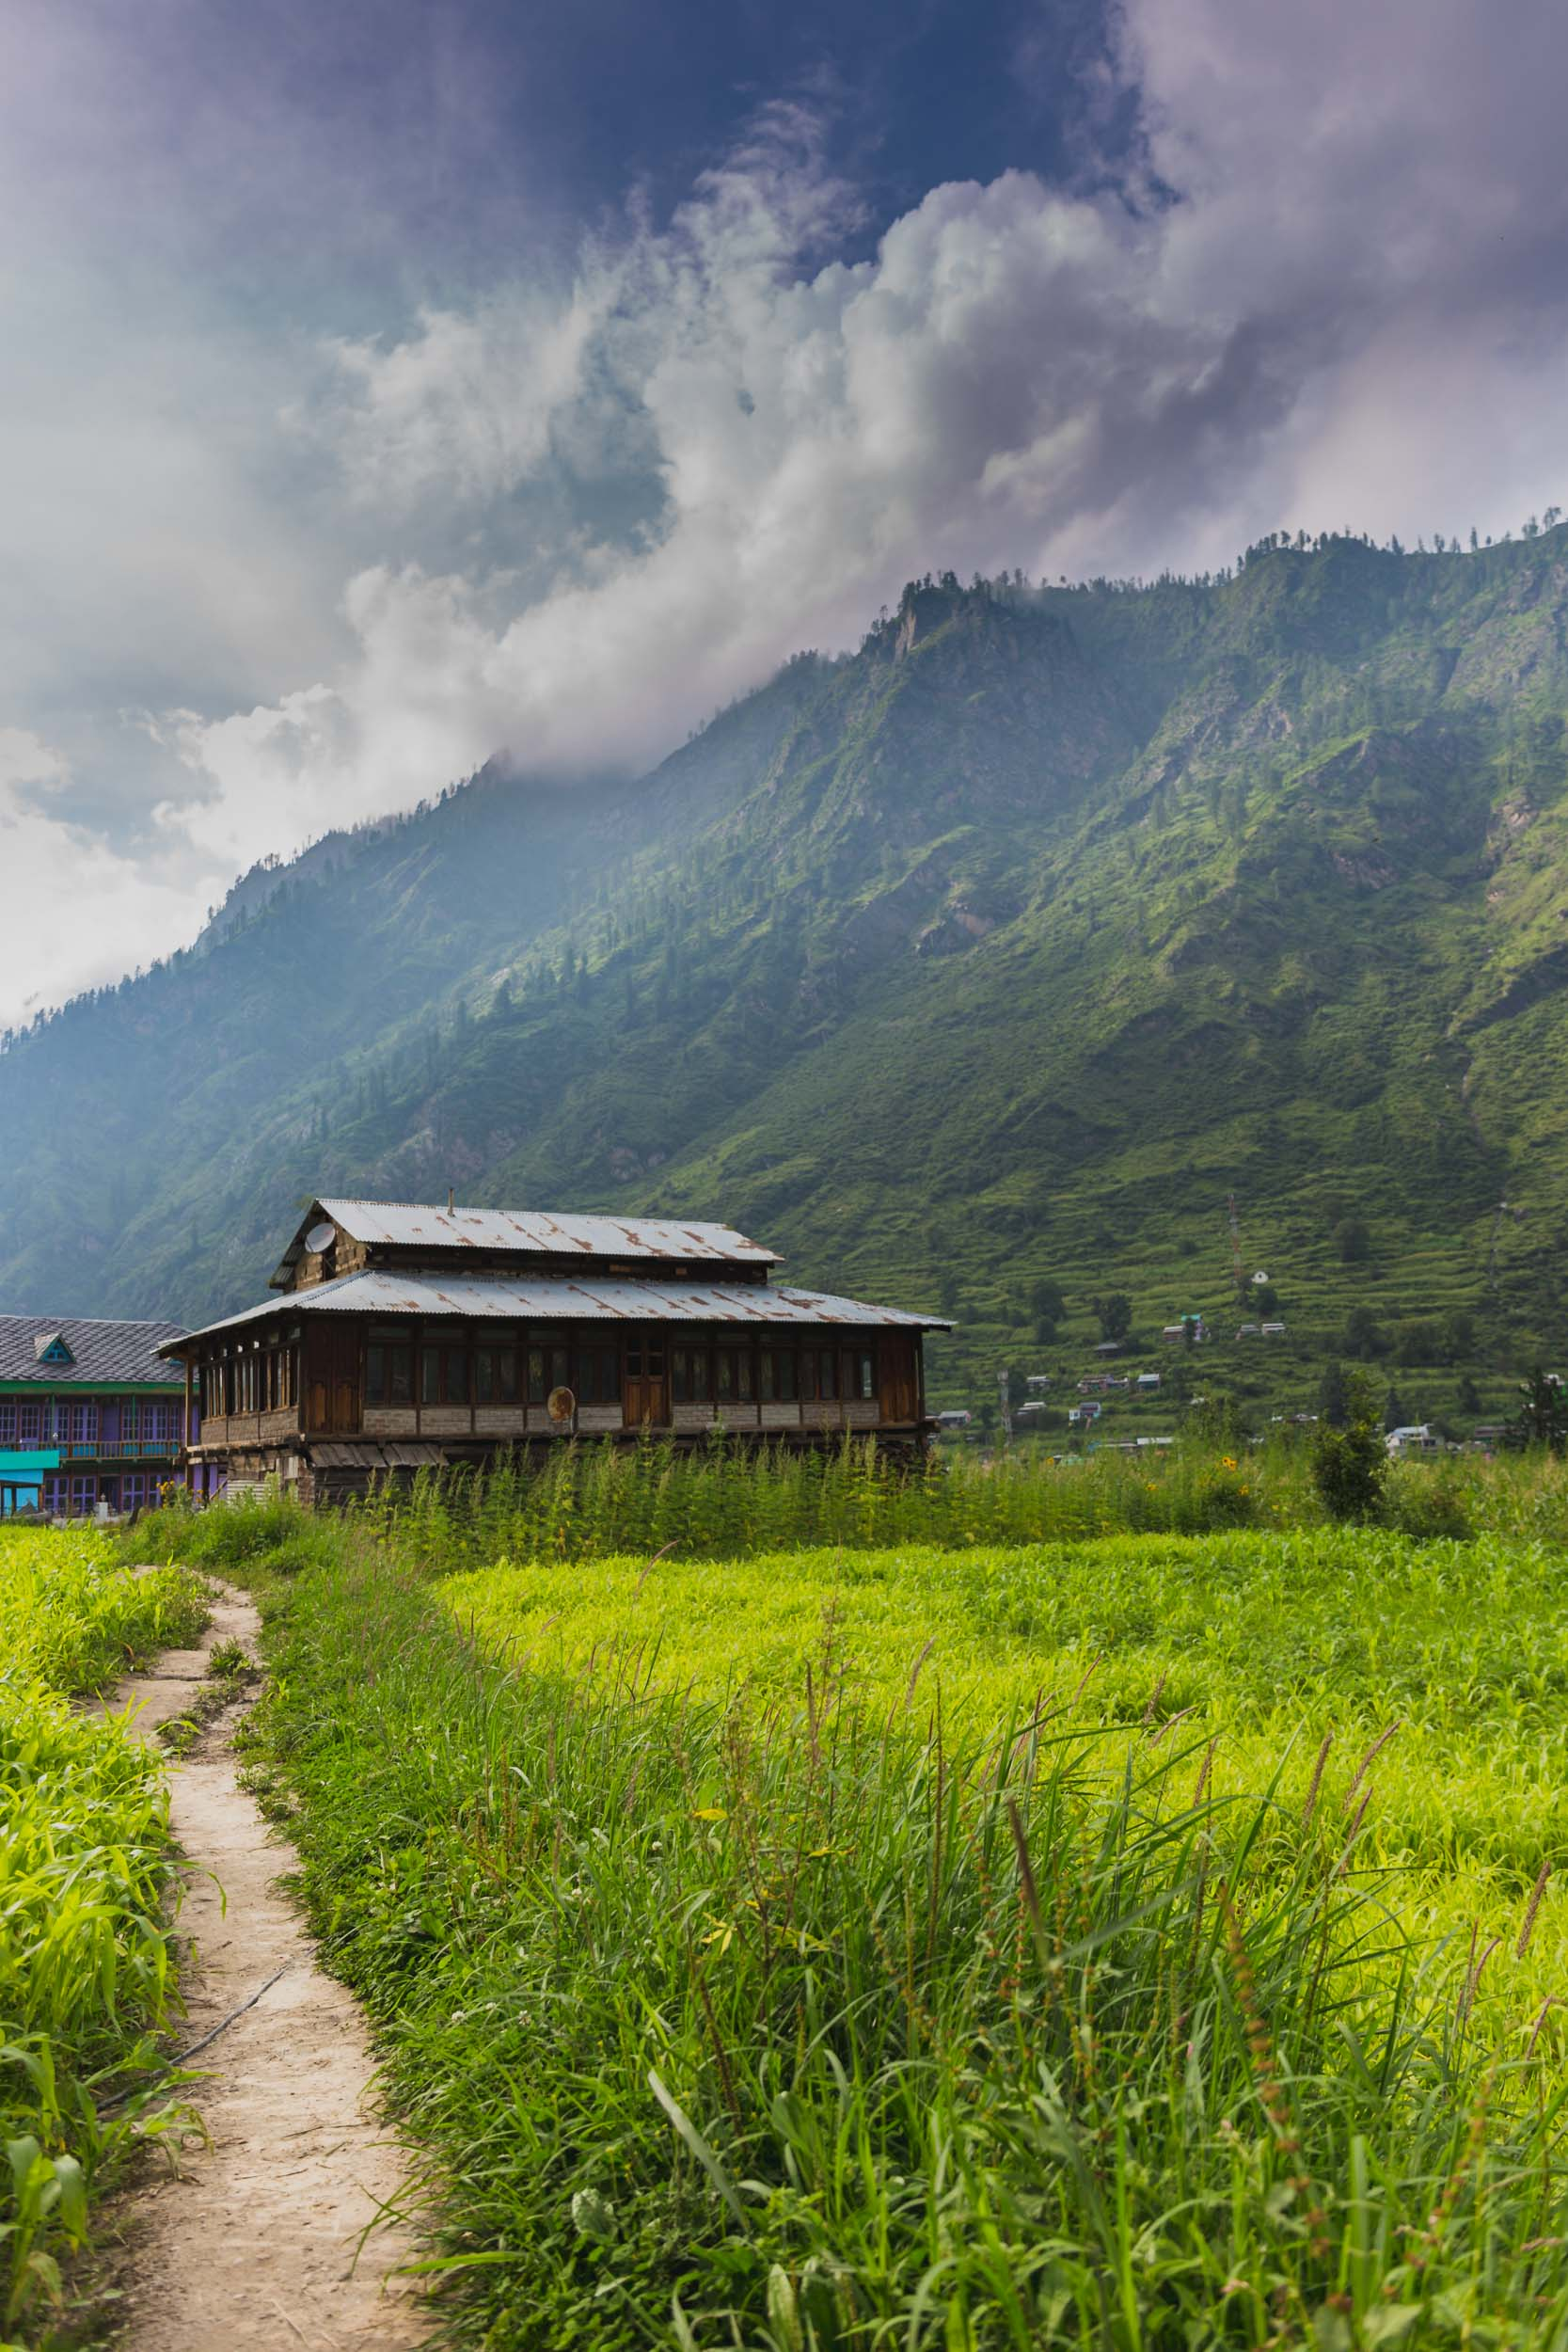 Pulga, Parvati Valley, India.